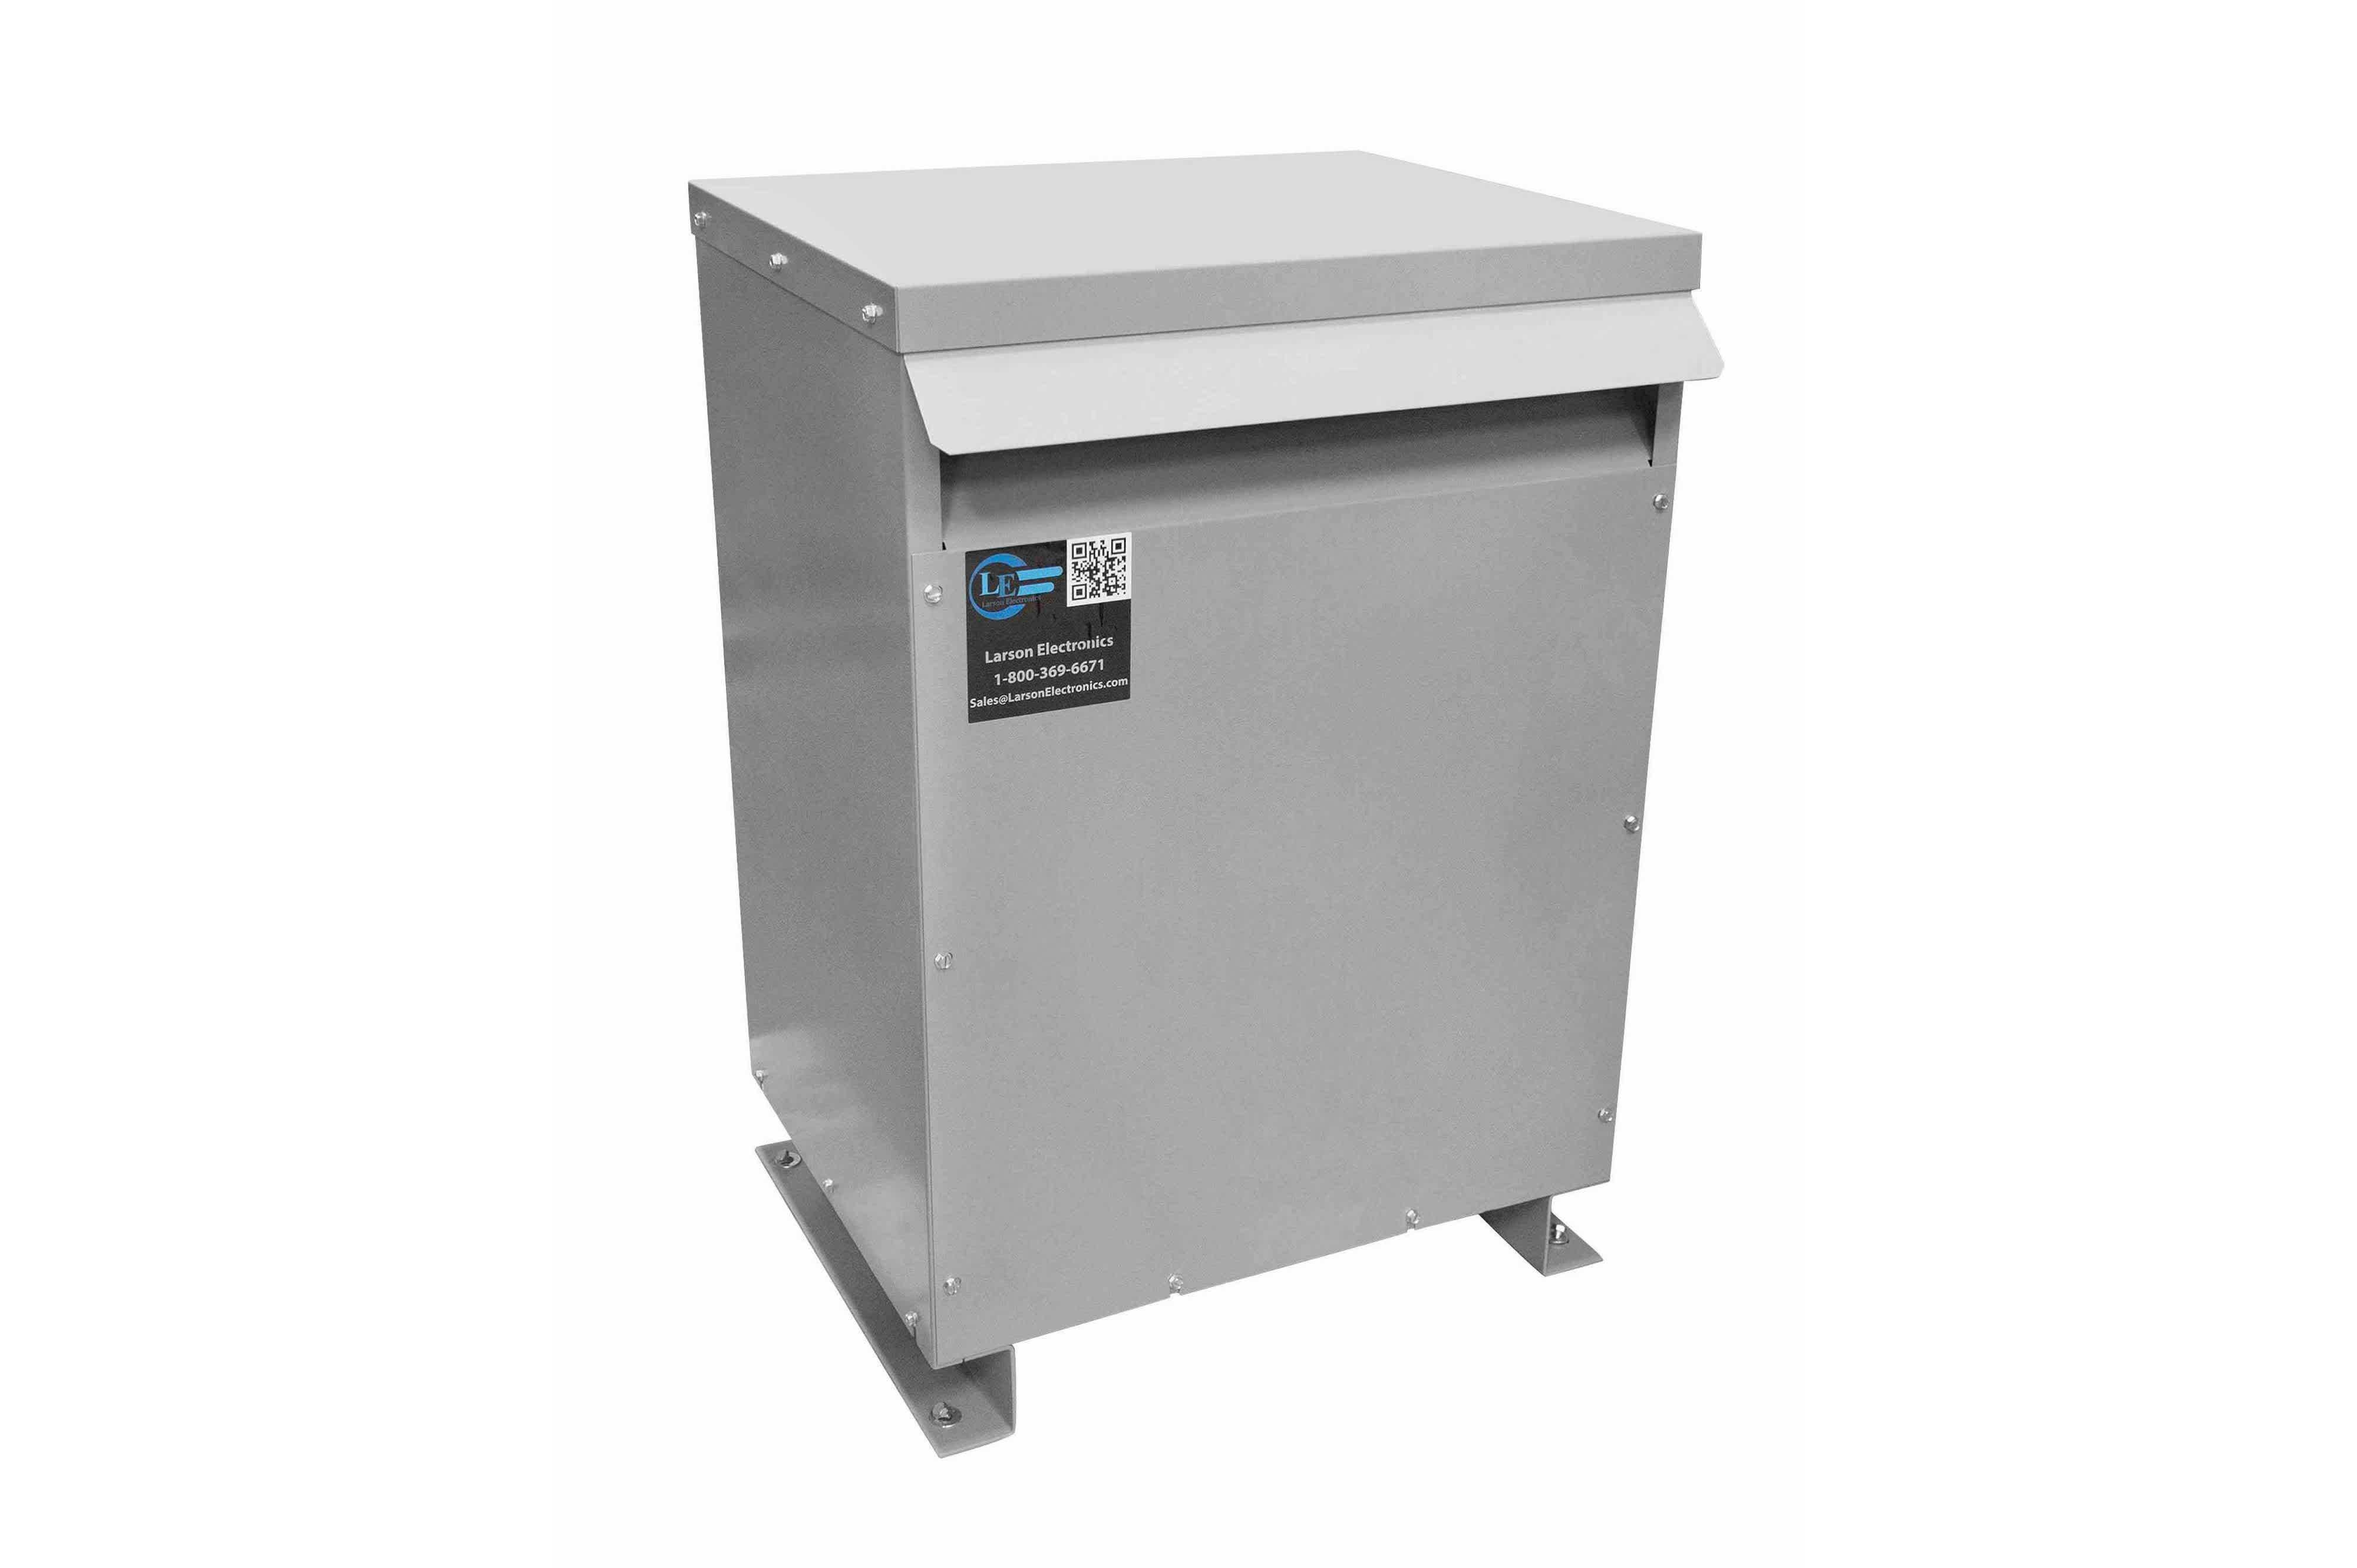 750 kVA 3PH DOE Transformer, 575V Delta Primary, 208Y/120 Wye-N Secondary, N3R, Ventilated, 60 Hz